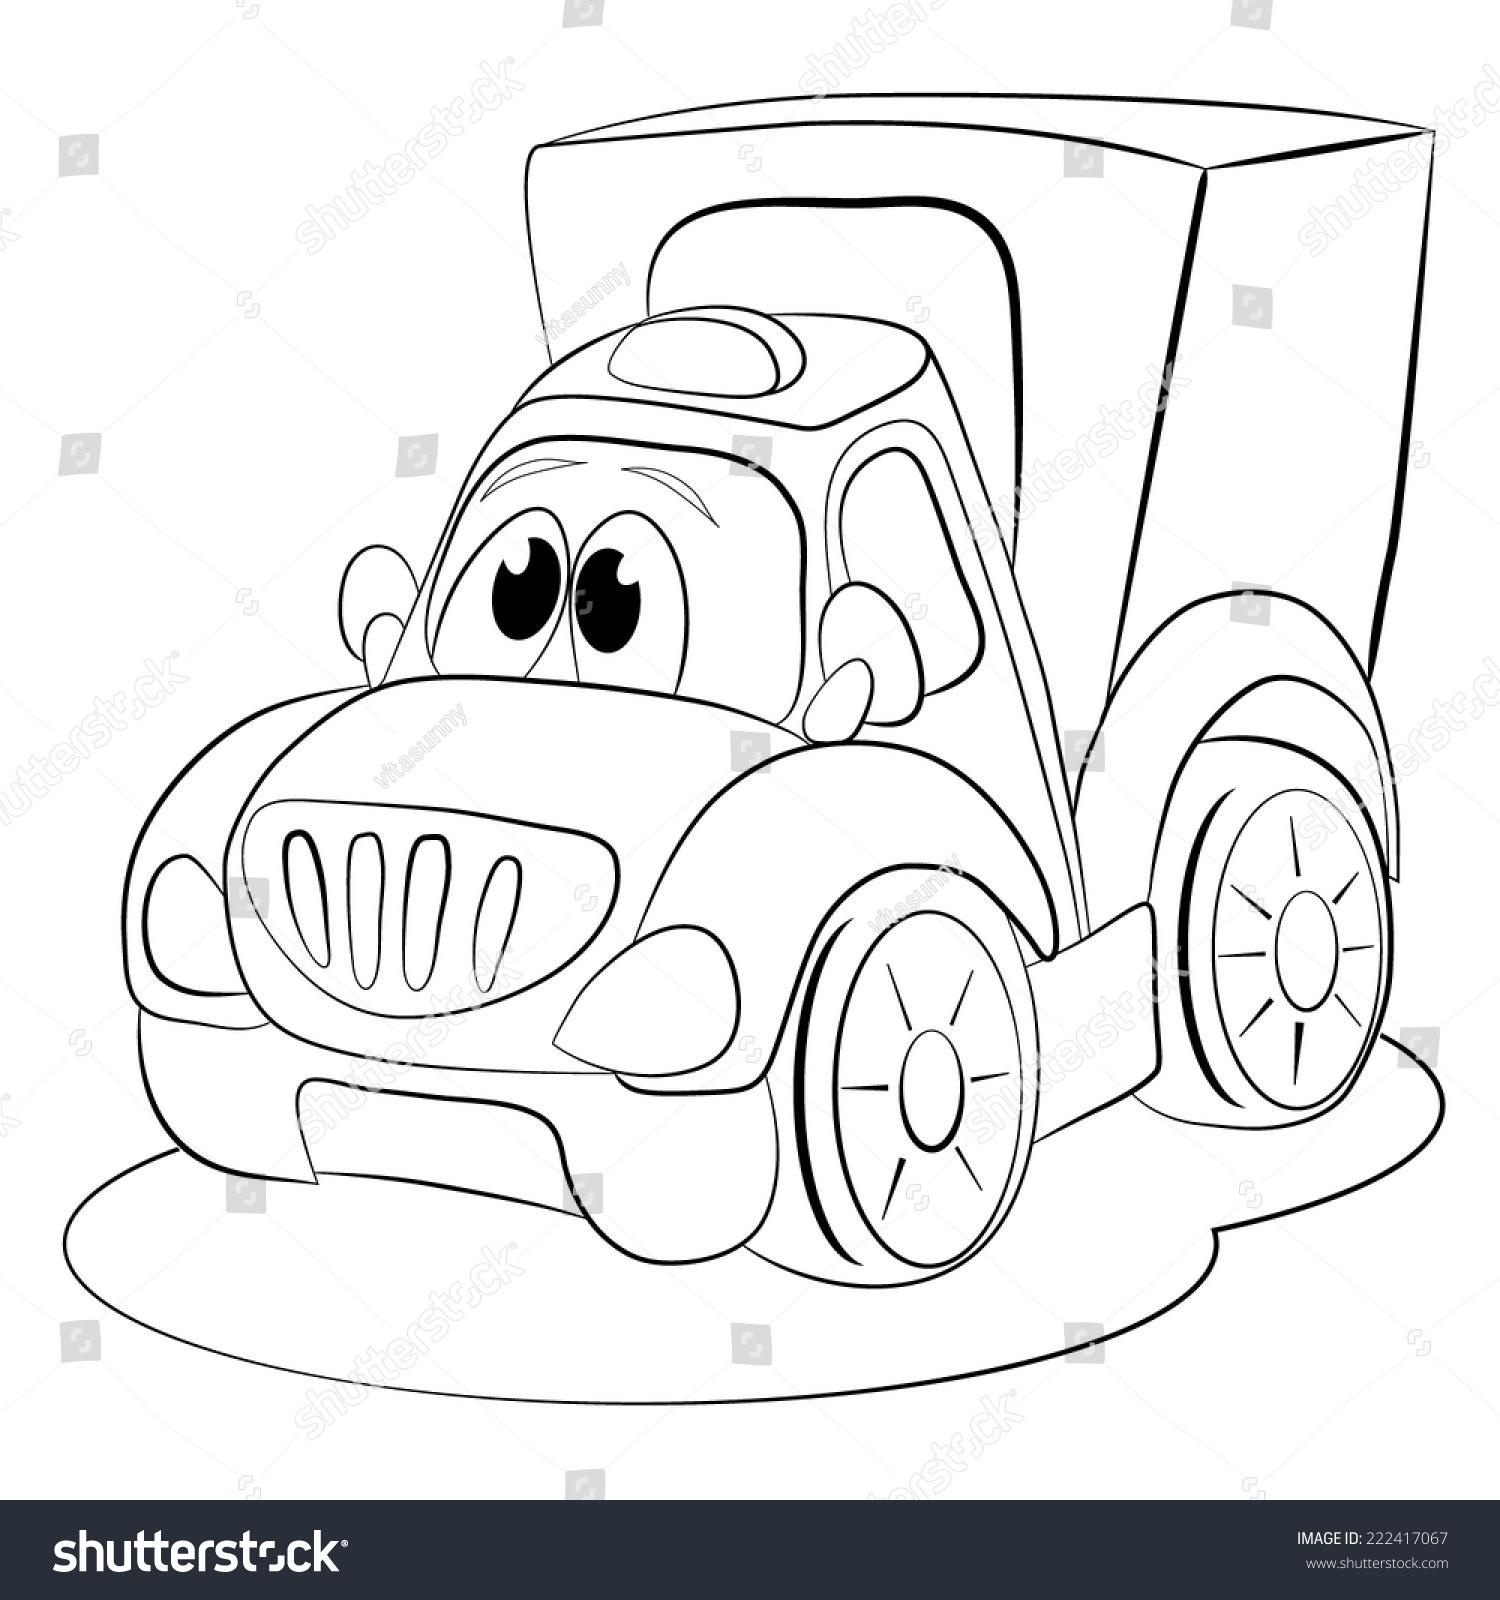 The coloring book race relations - Coloring Book Cartoon Funny Car Van